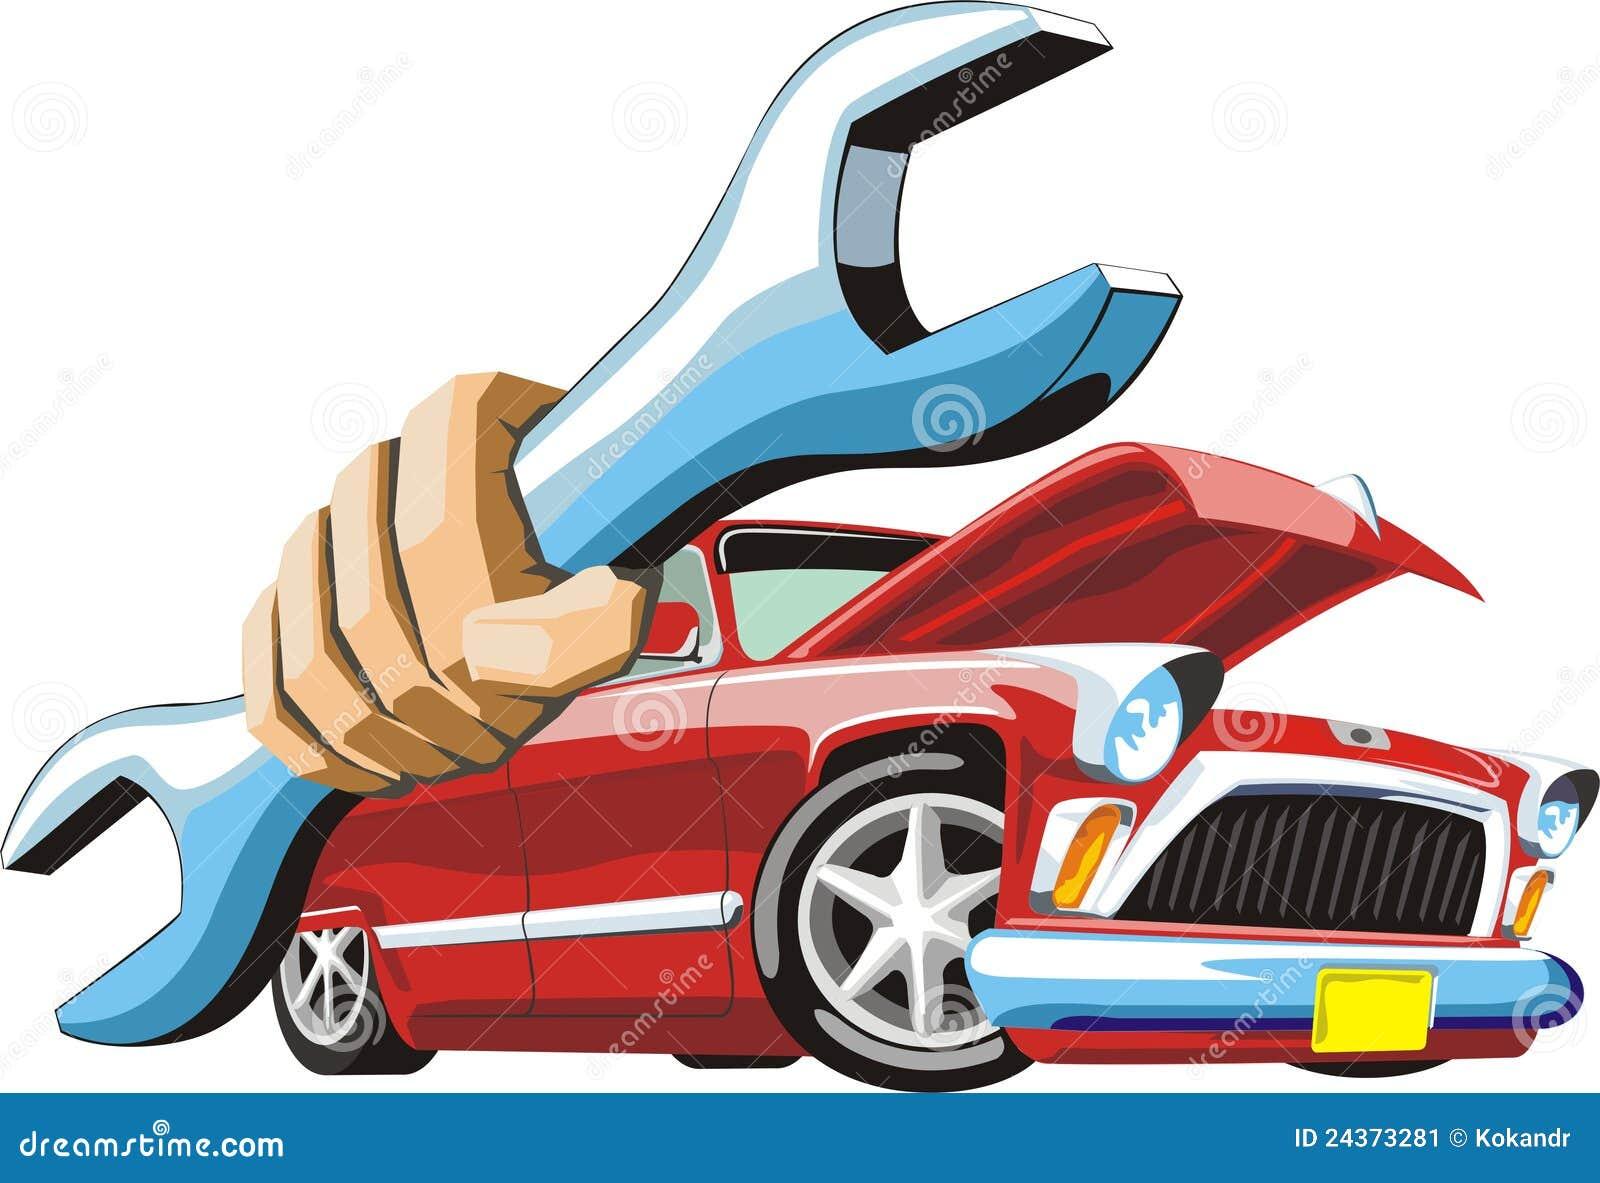 Porsche 944 2 5 Drift Car moreover Stock Image Steel Gear Wrench Tool Image28120211 moreover 15191638432 besides Fotos De Archivo Iconos Autos Del Vector Fijados Image34984993 additionally Fotografering F C3 B6r Bildbyr C3 A5er Bilreparation Image24373281. on 3d car repair